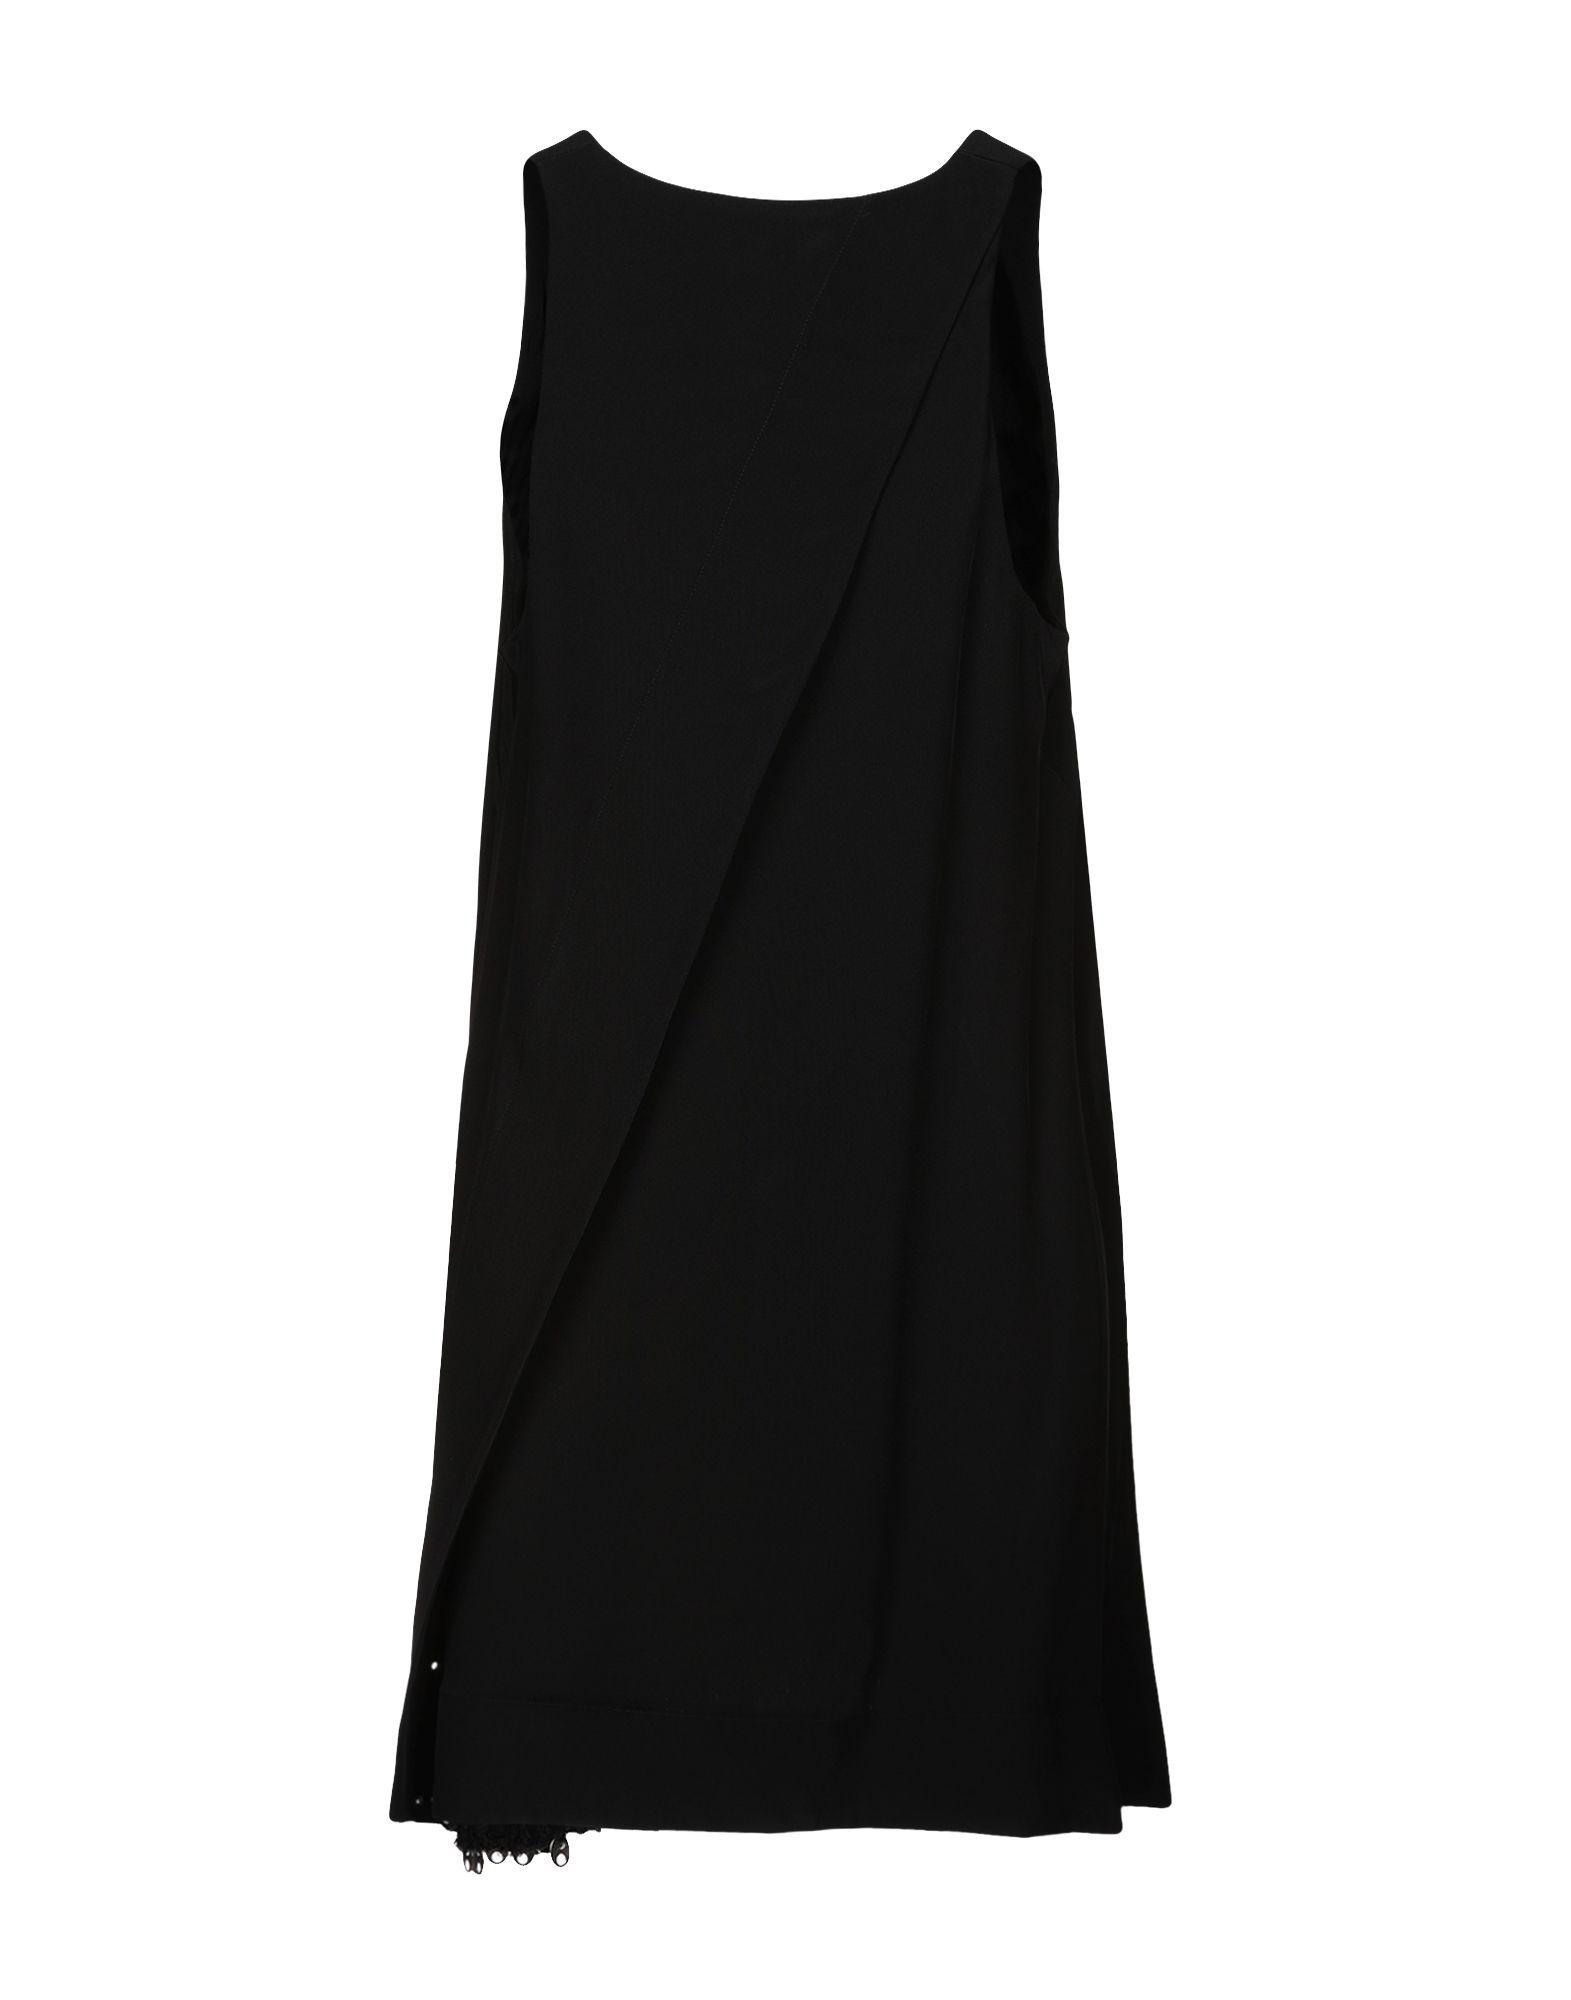 DRESSES Woman Paco Rabanne Black Acetate